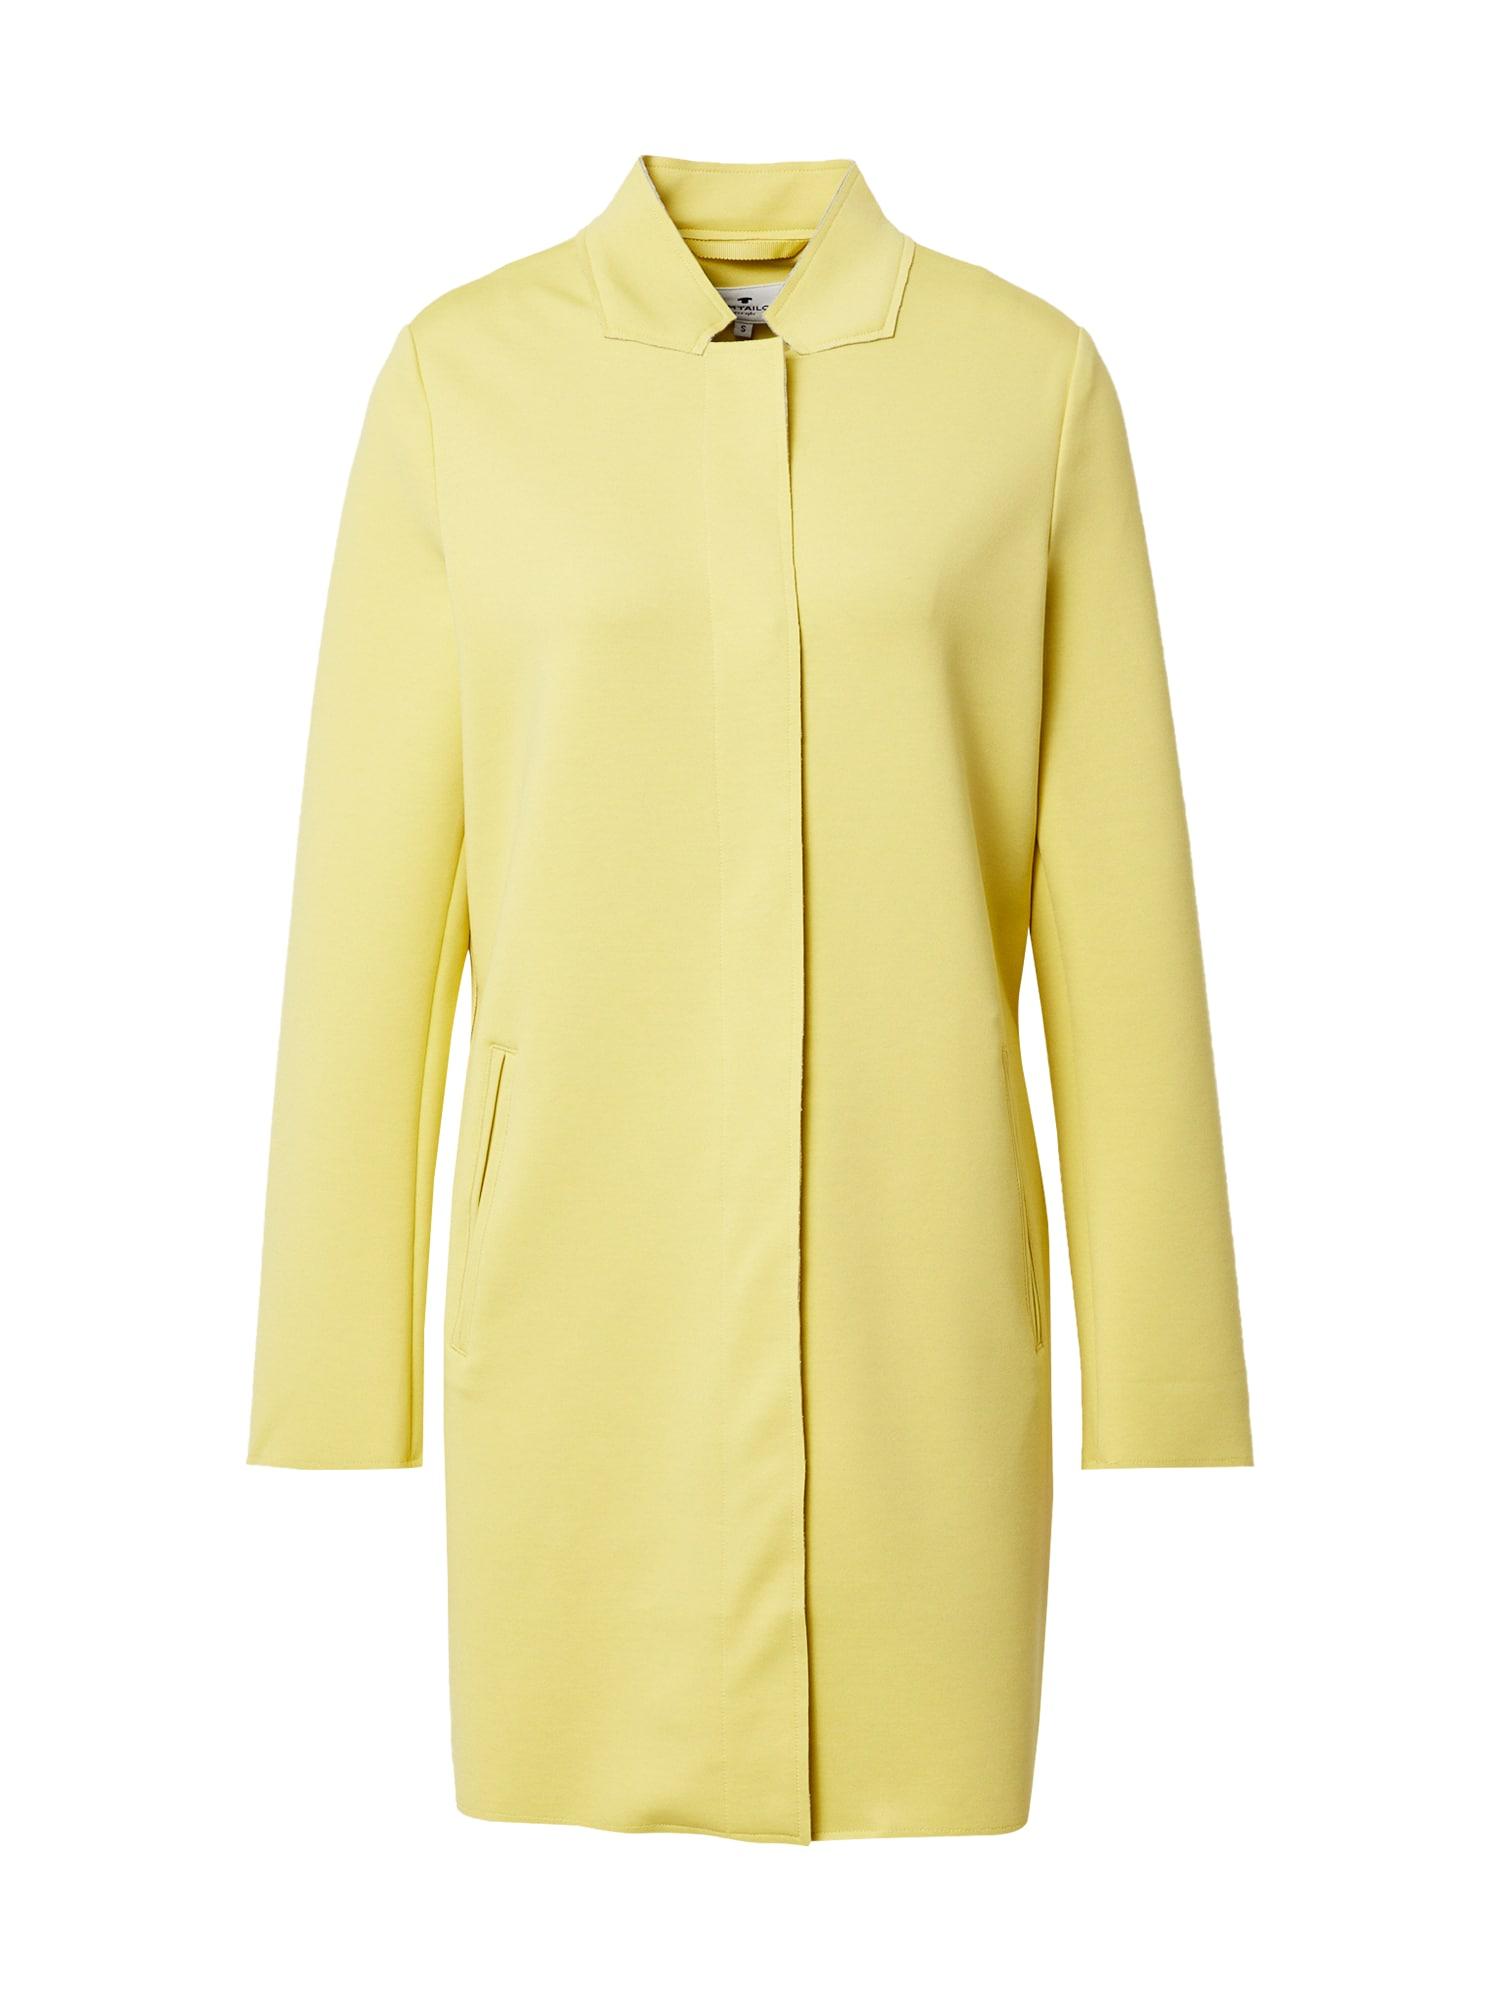 TOM TAILOR Demisezoninis paltas geltona